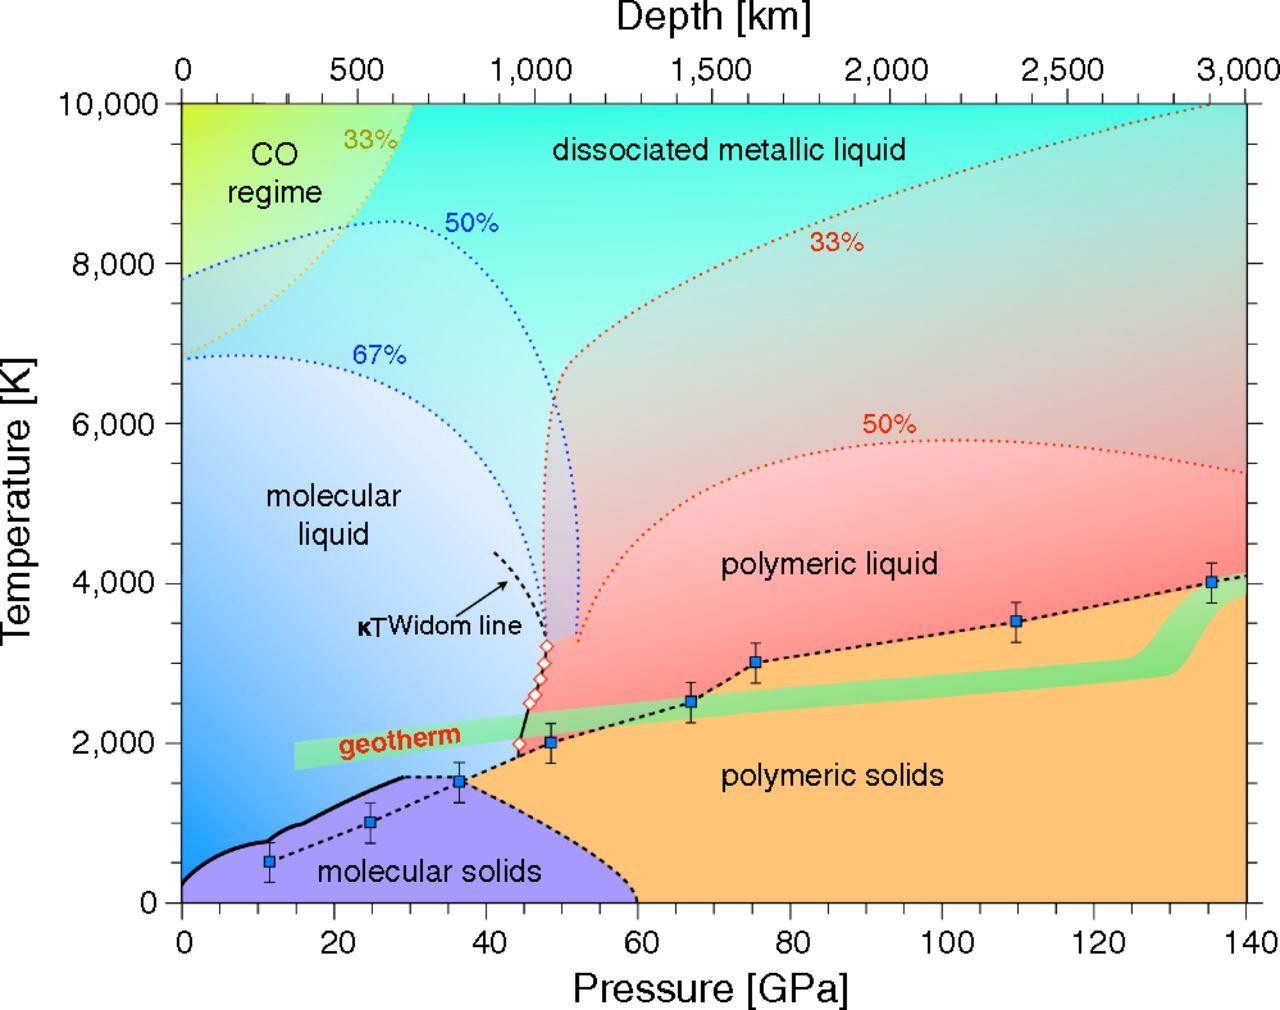 Thermodynamic phase diagram irshad pinterest diagram and geology thermodynamic phase diagram ccuart Images